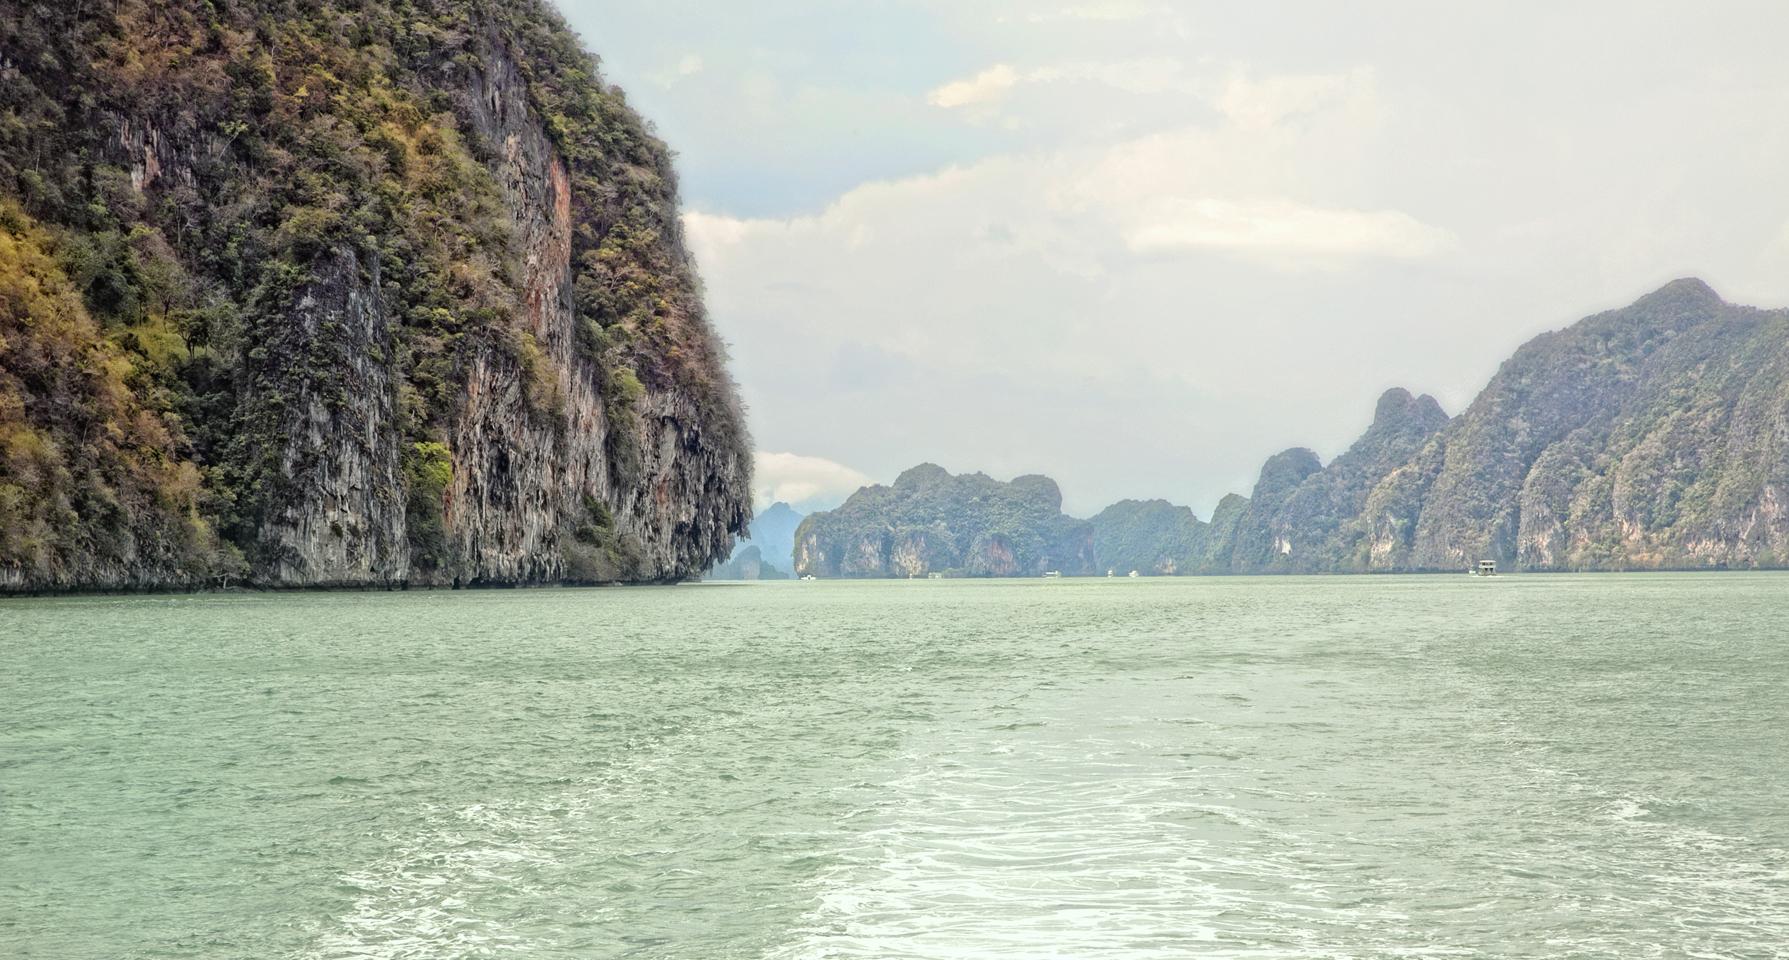 James Bond Isl Phuket Thailand 3516